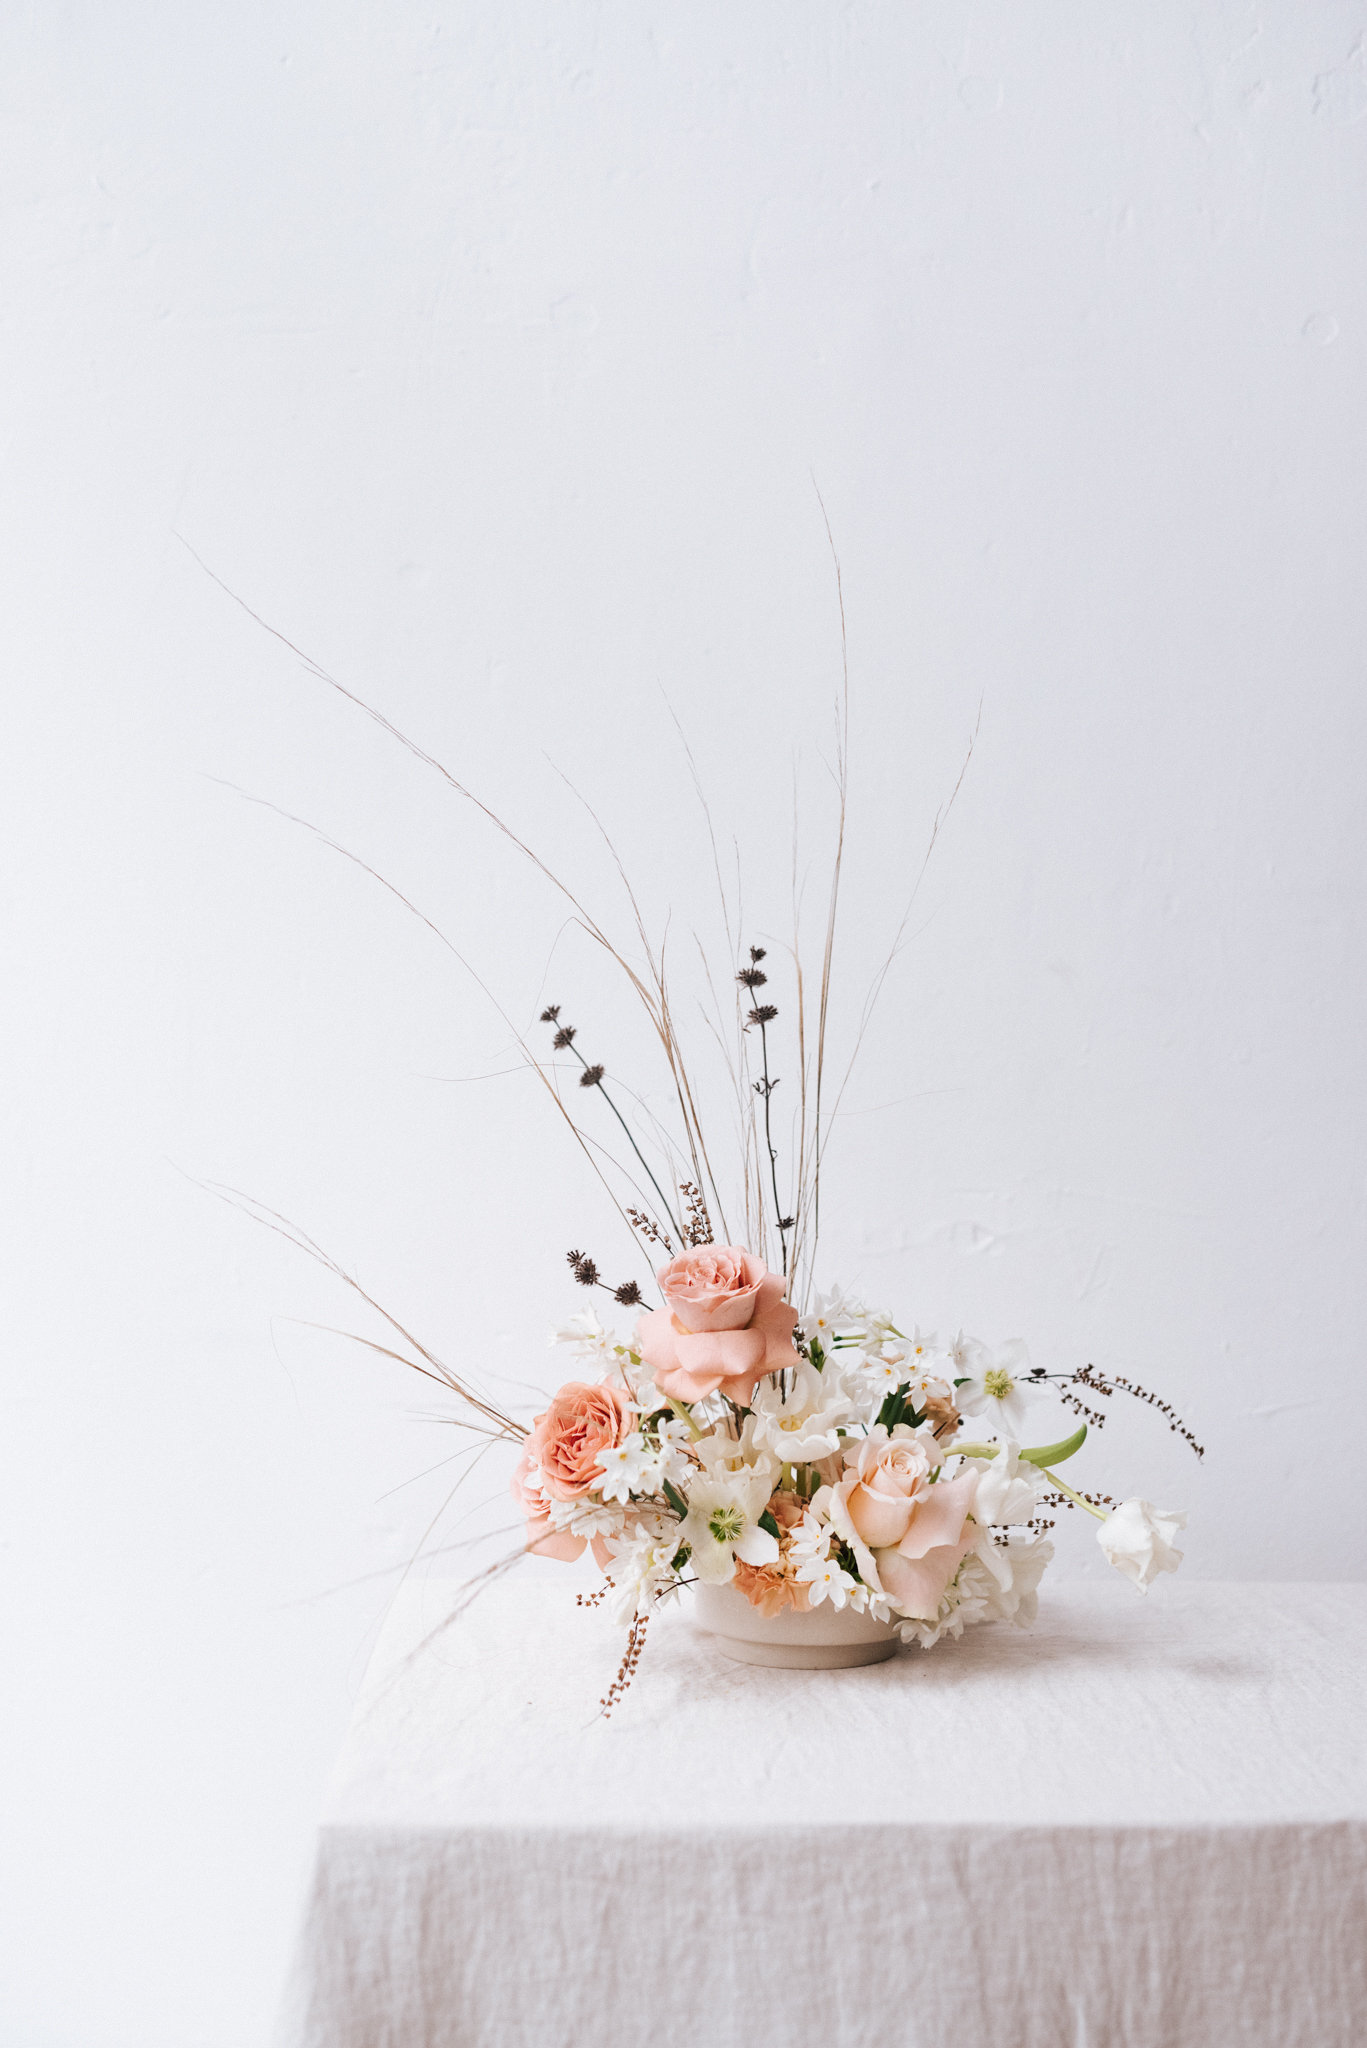 JaunePivoine-fleuristemariage-lyon107